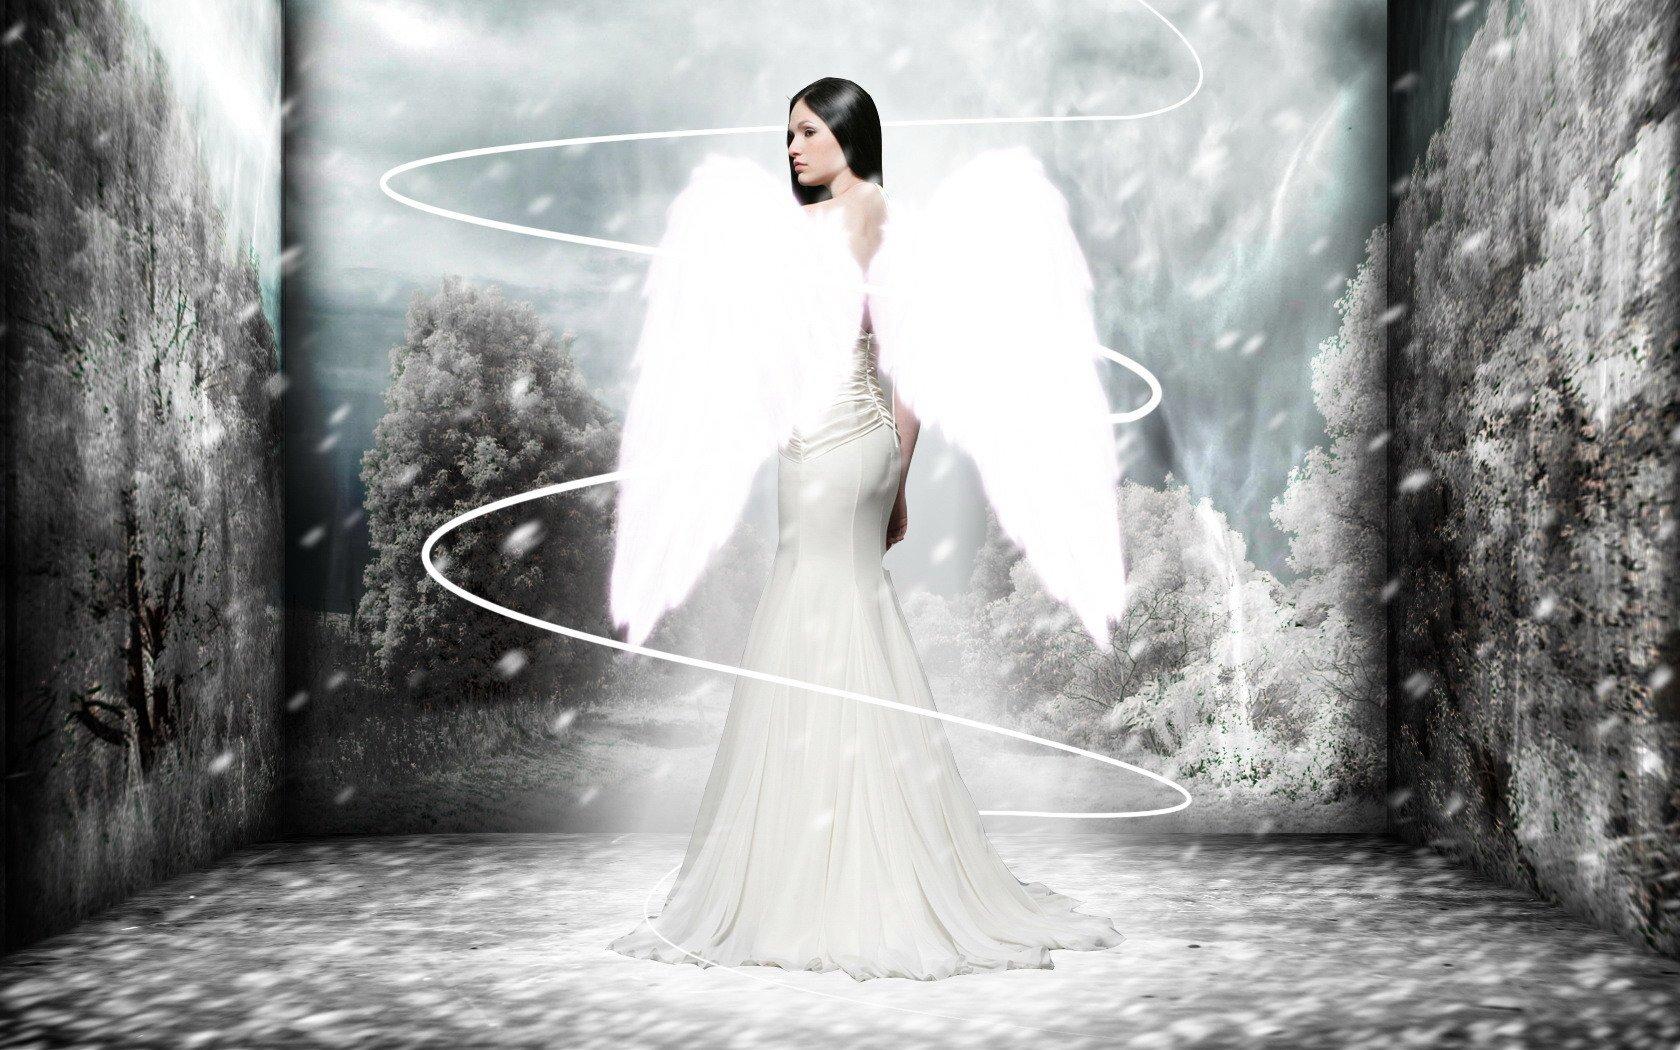 Фэнтези - Ангел  Фэнтези Wings Обои